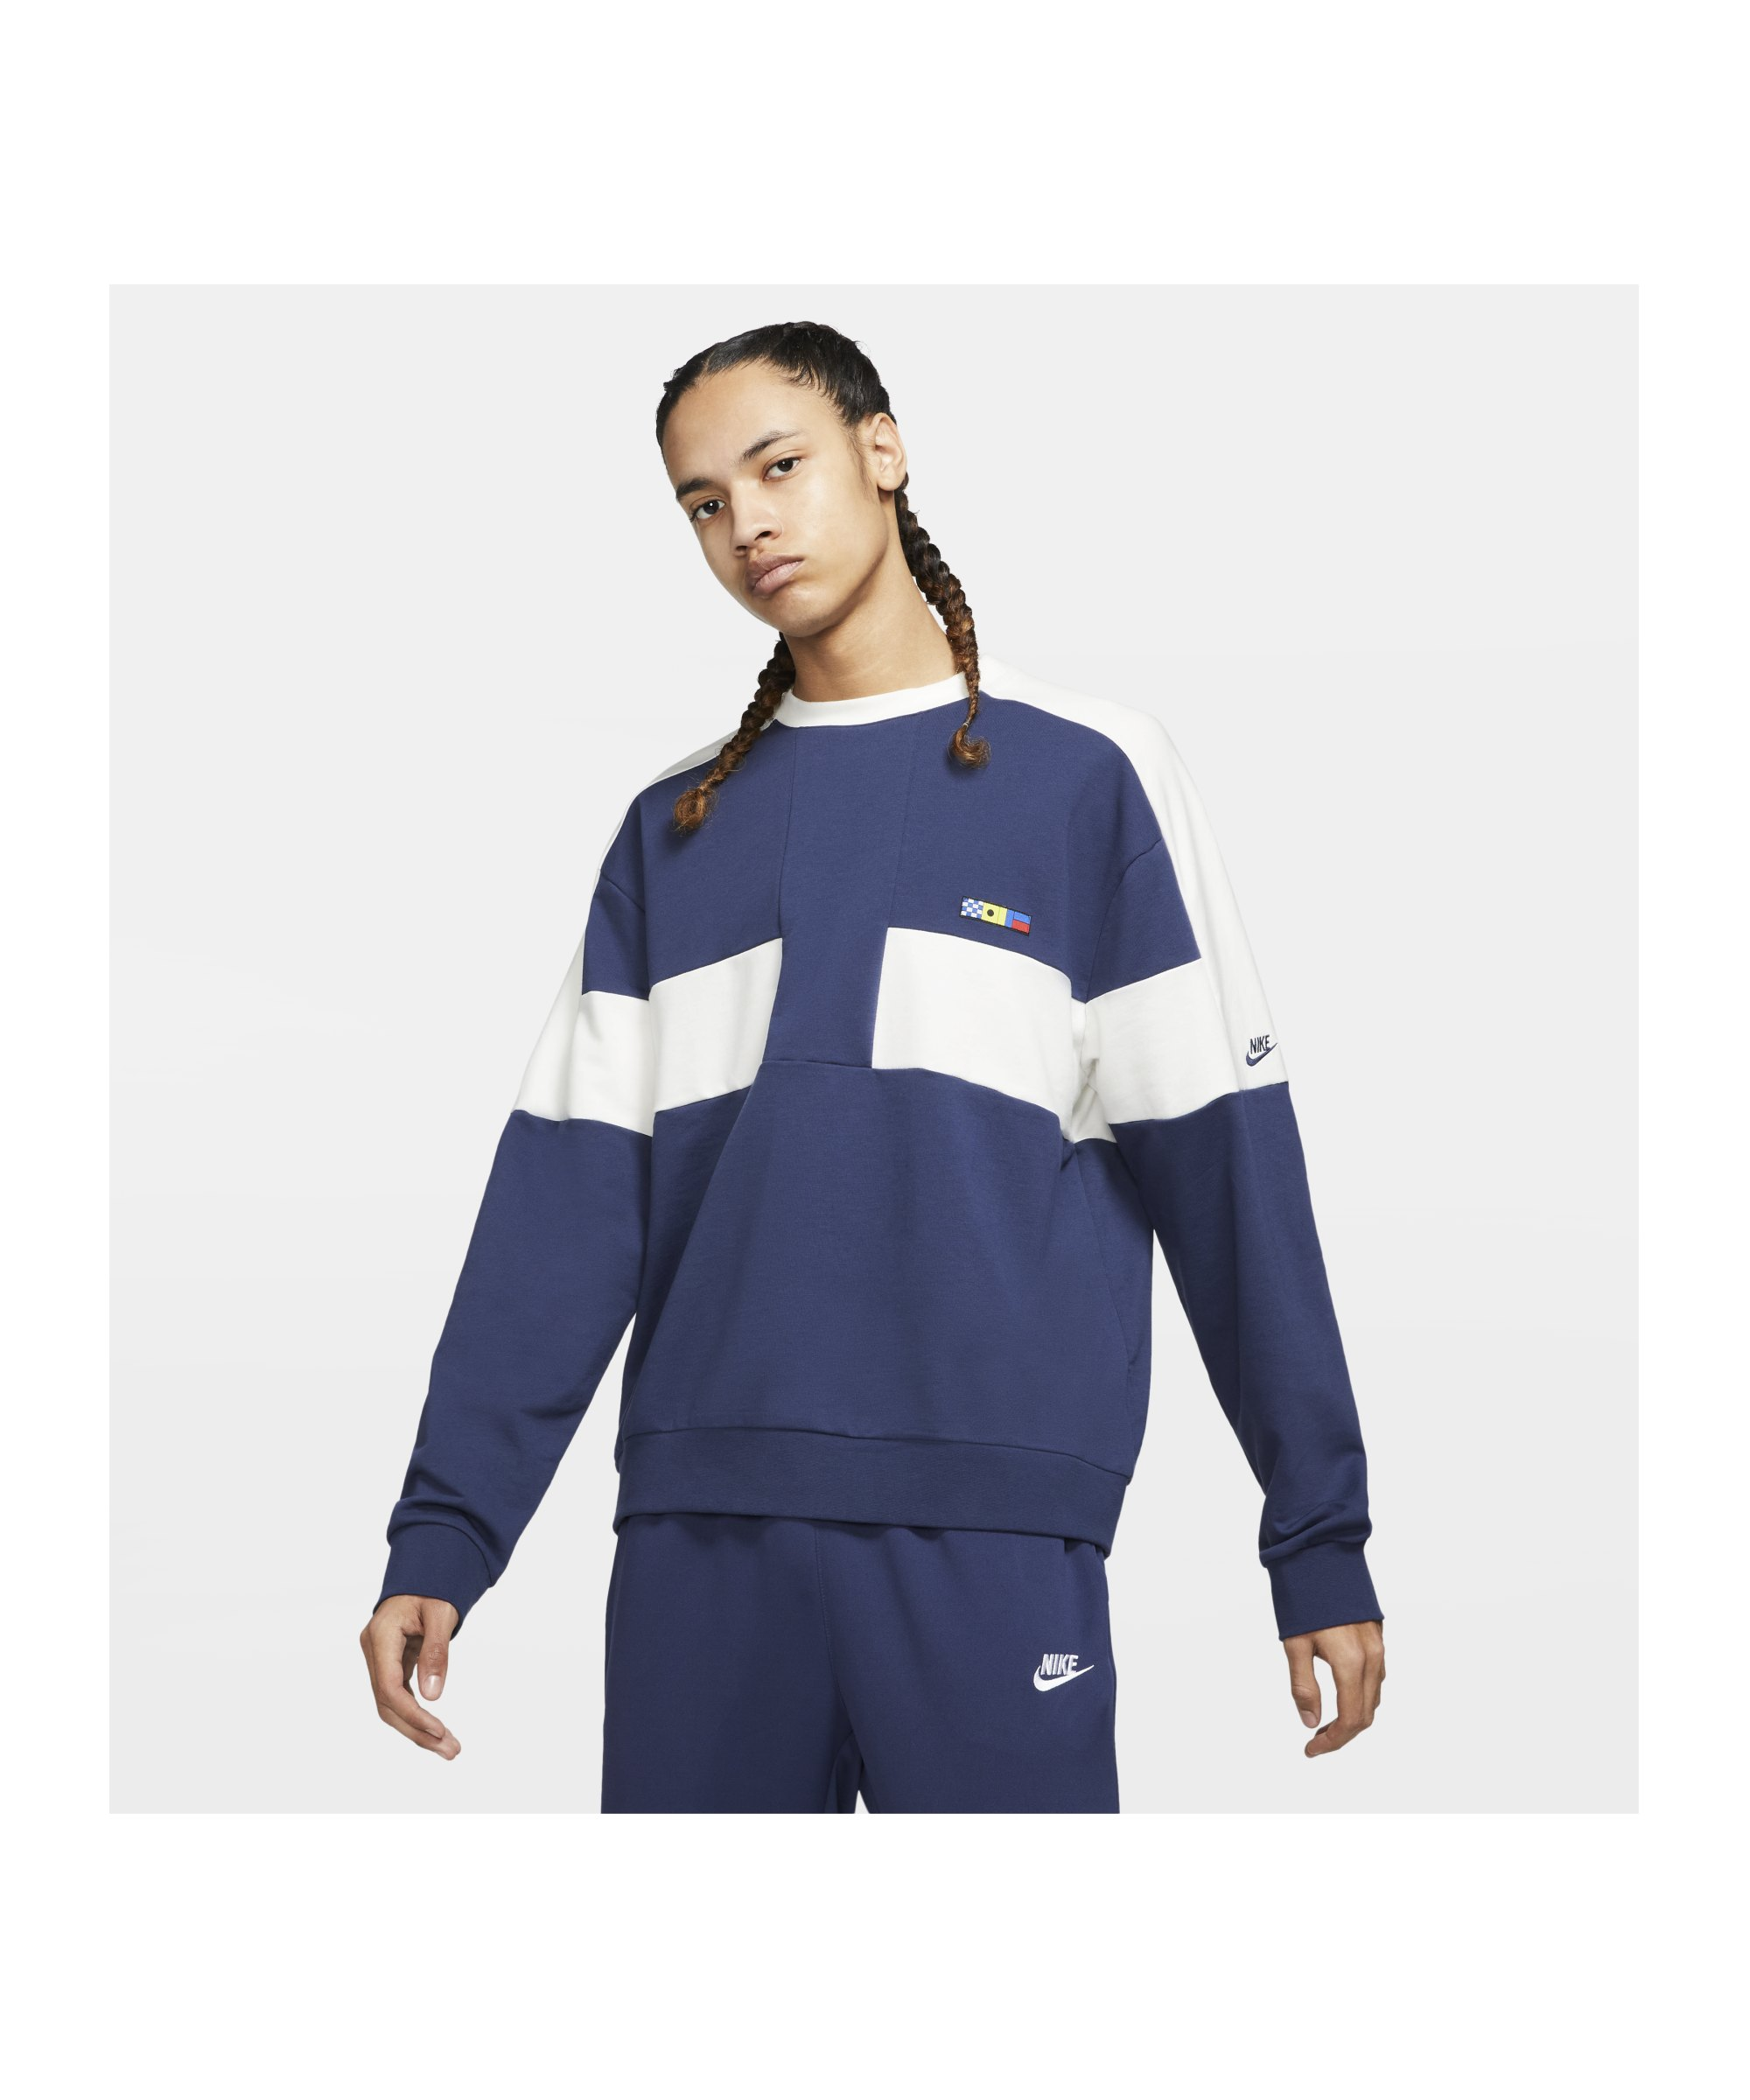 Nike Reissue Fairlead Sweatshirt Blau Weiss F410 - blau